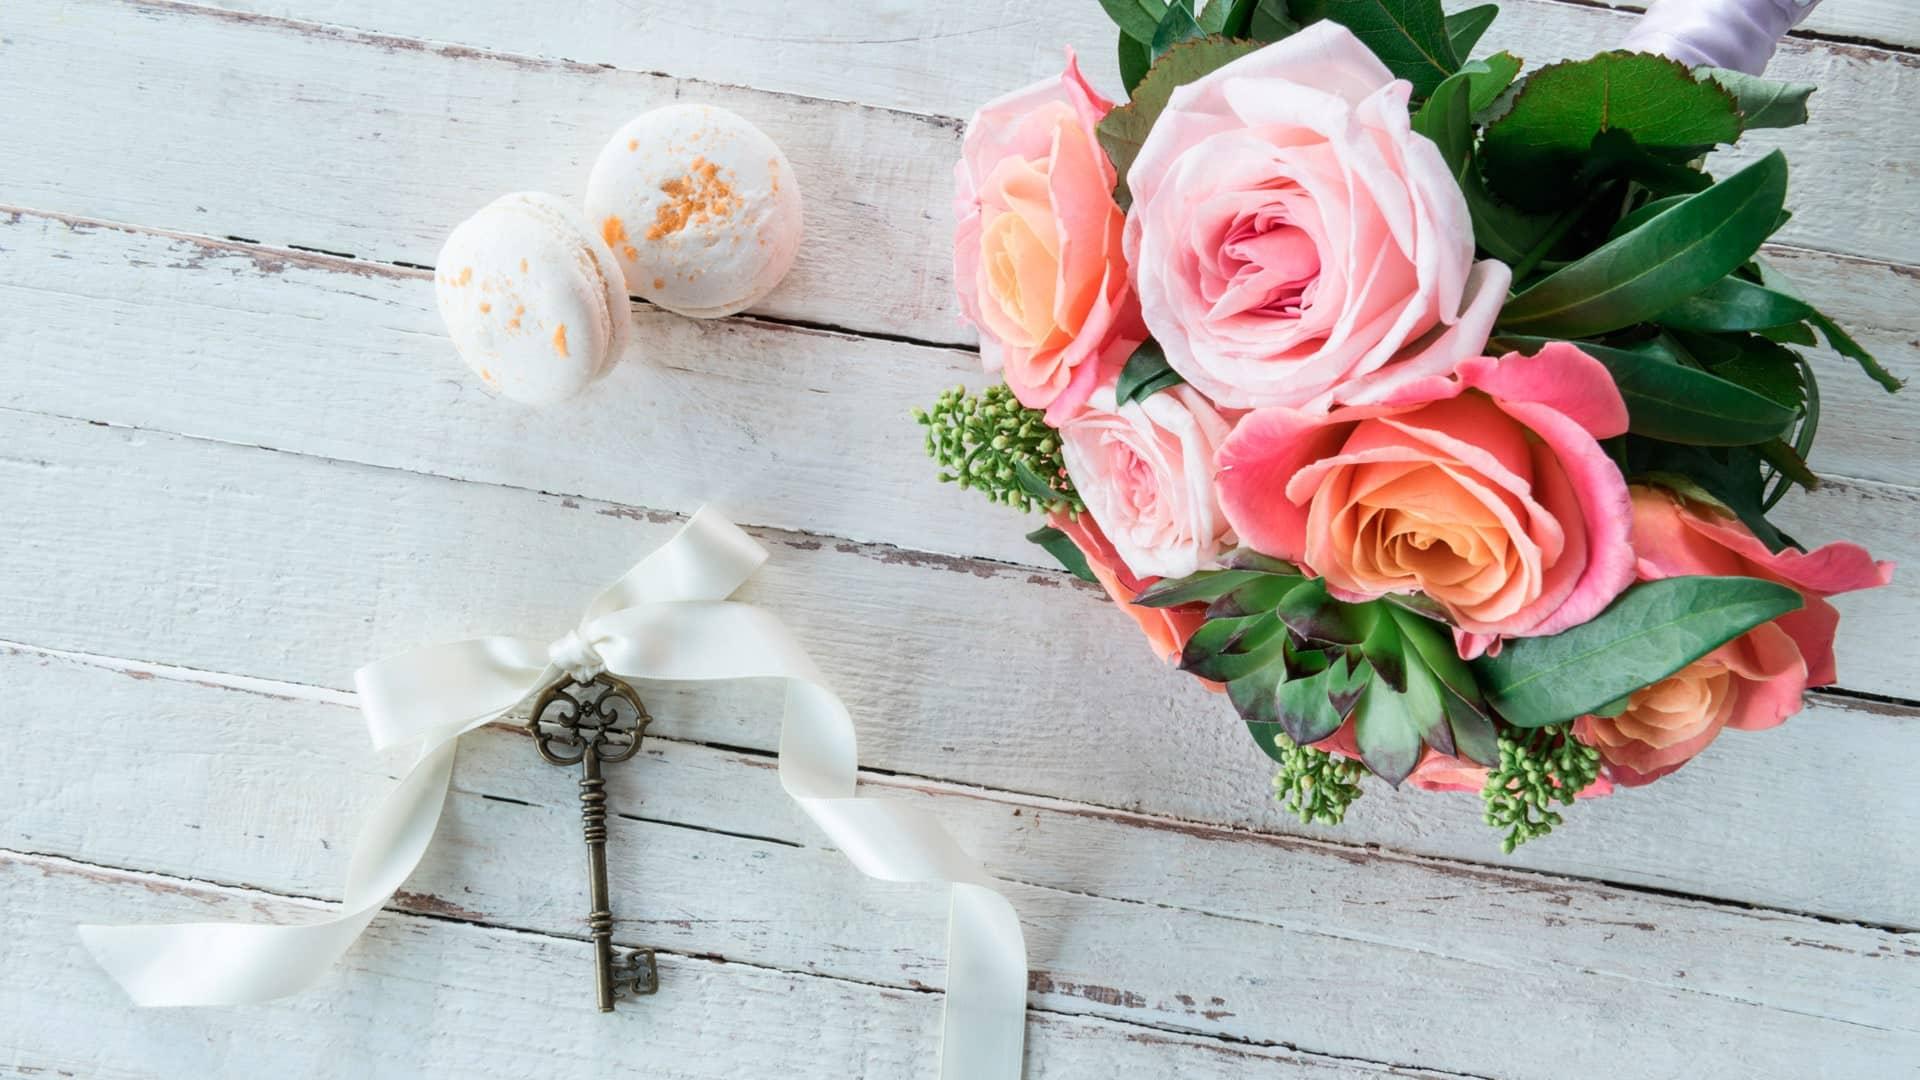 randers blomster